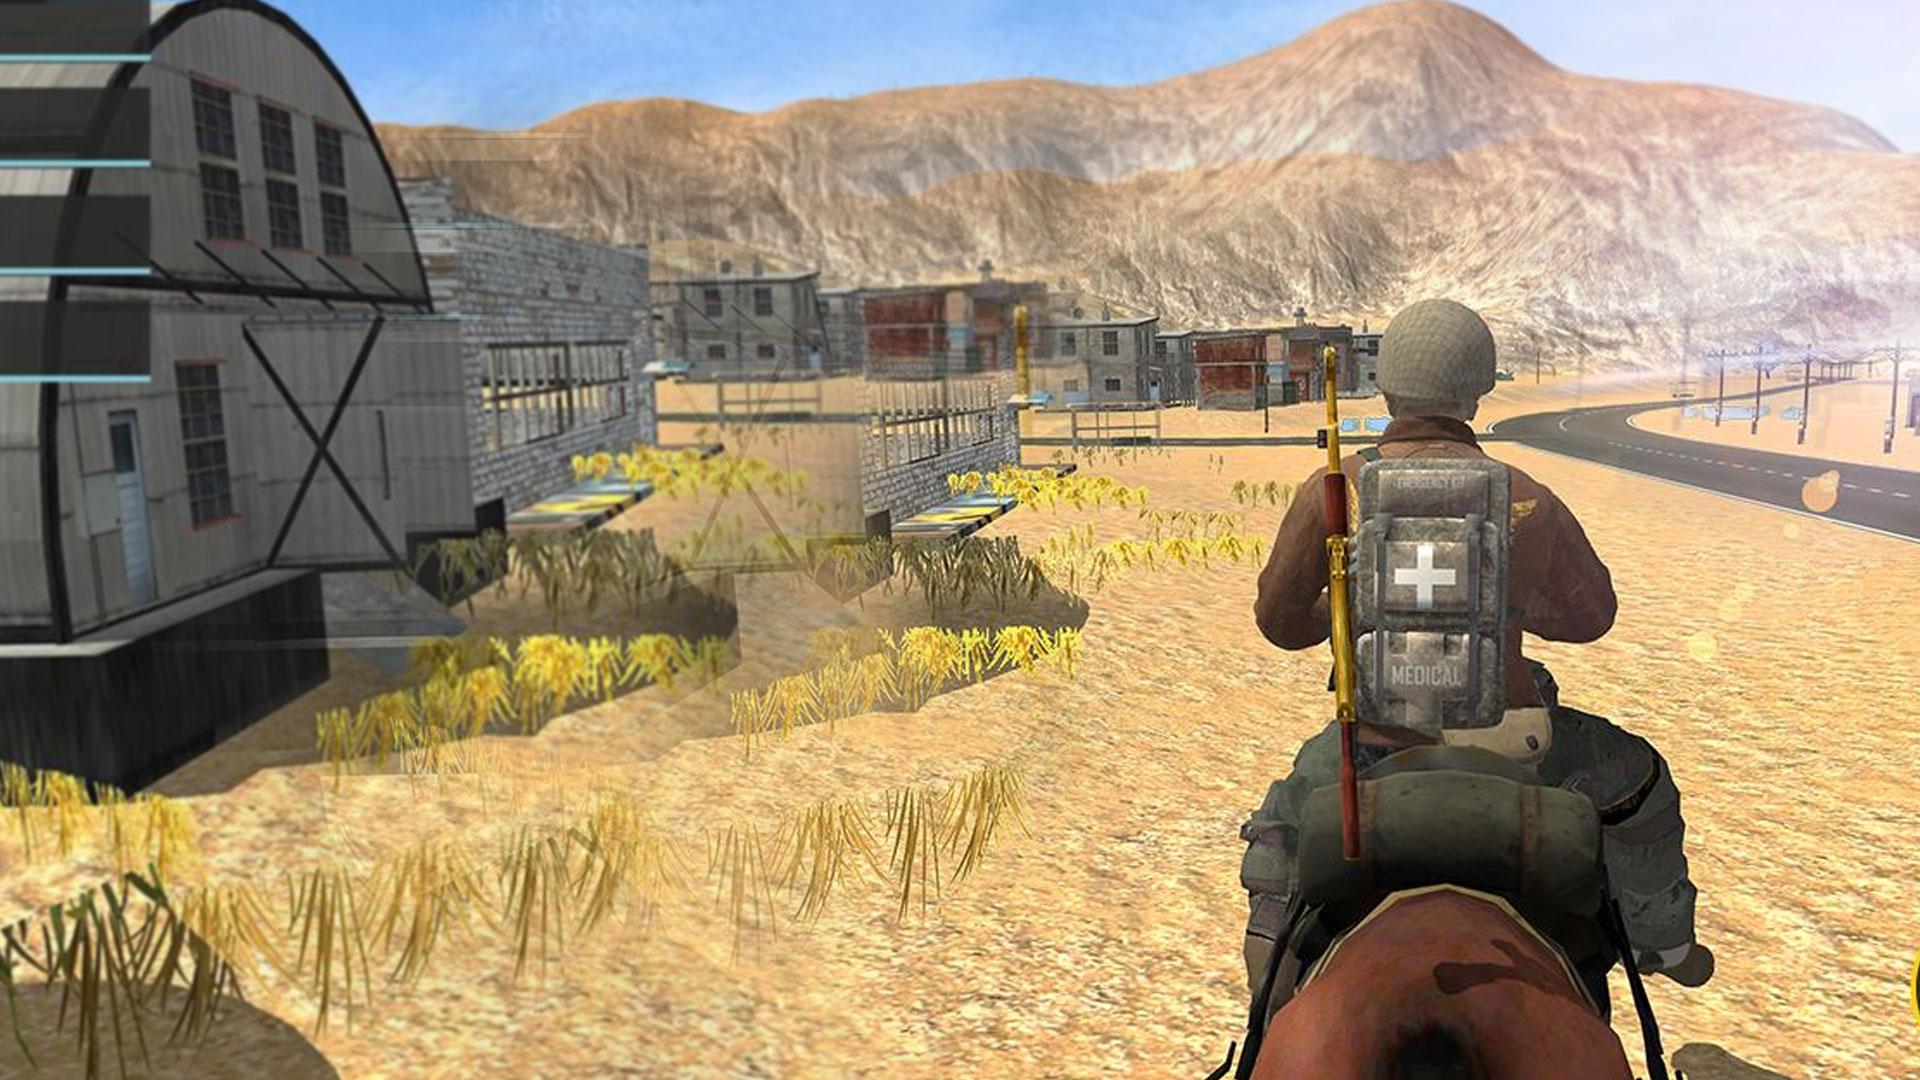 Download Amp Play Desert Survival Shooting Game On Pc Amp Mac